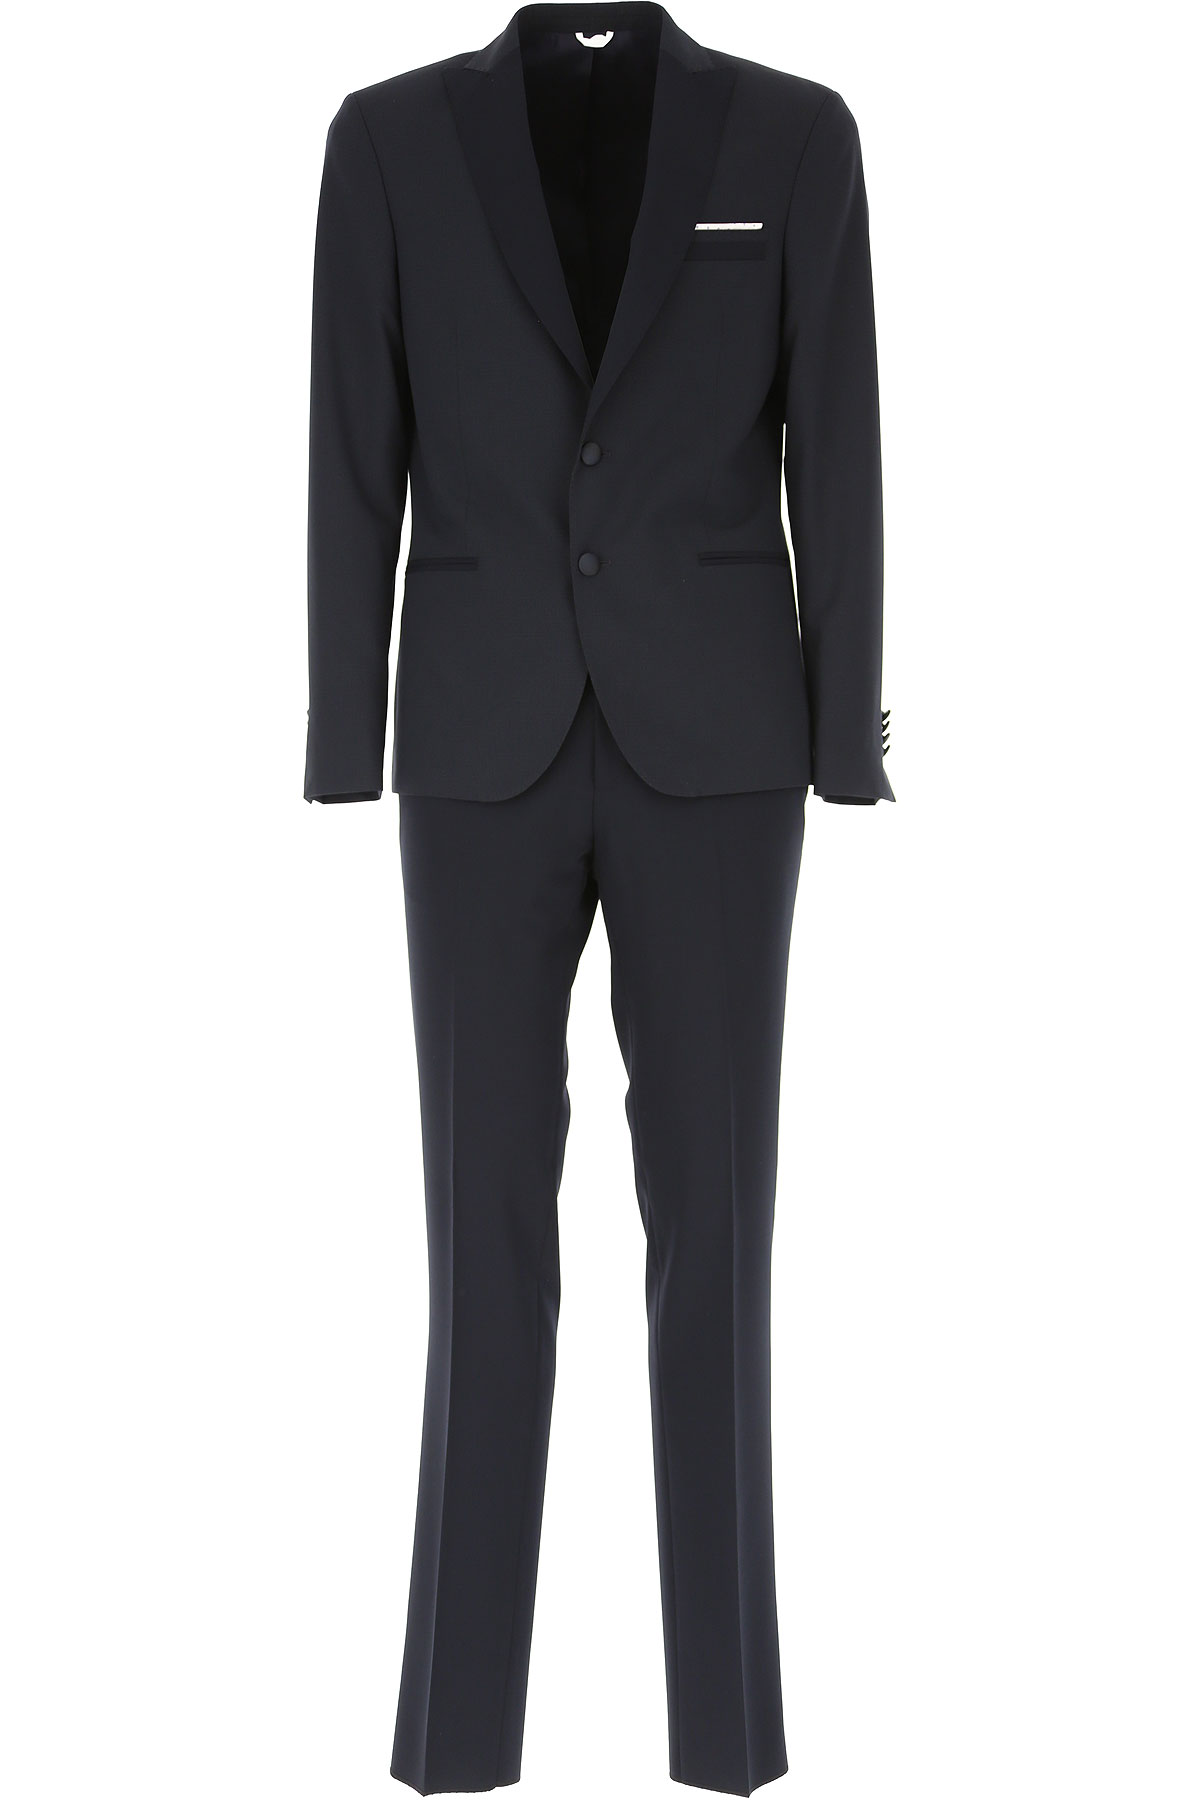 Simbols Men's Suit, Dark Blue, polyamide, 2019, L M XXL